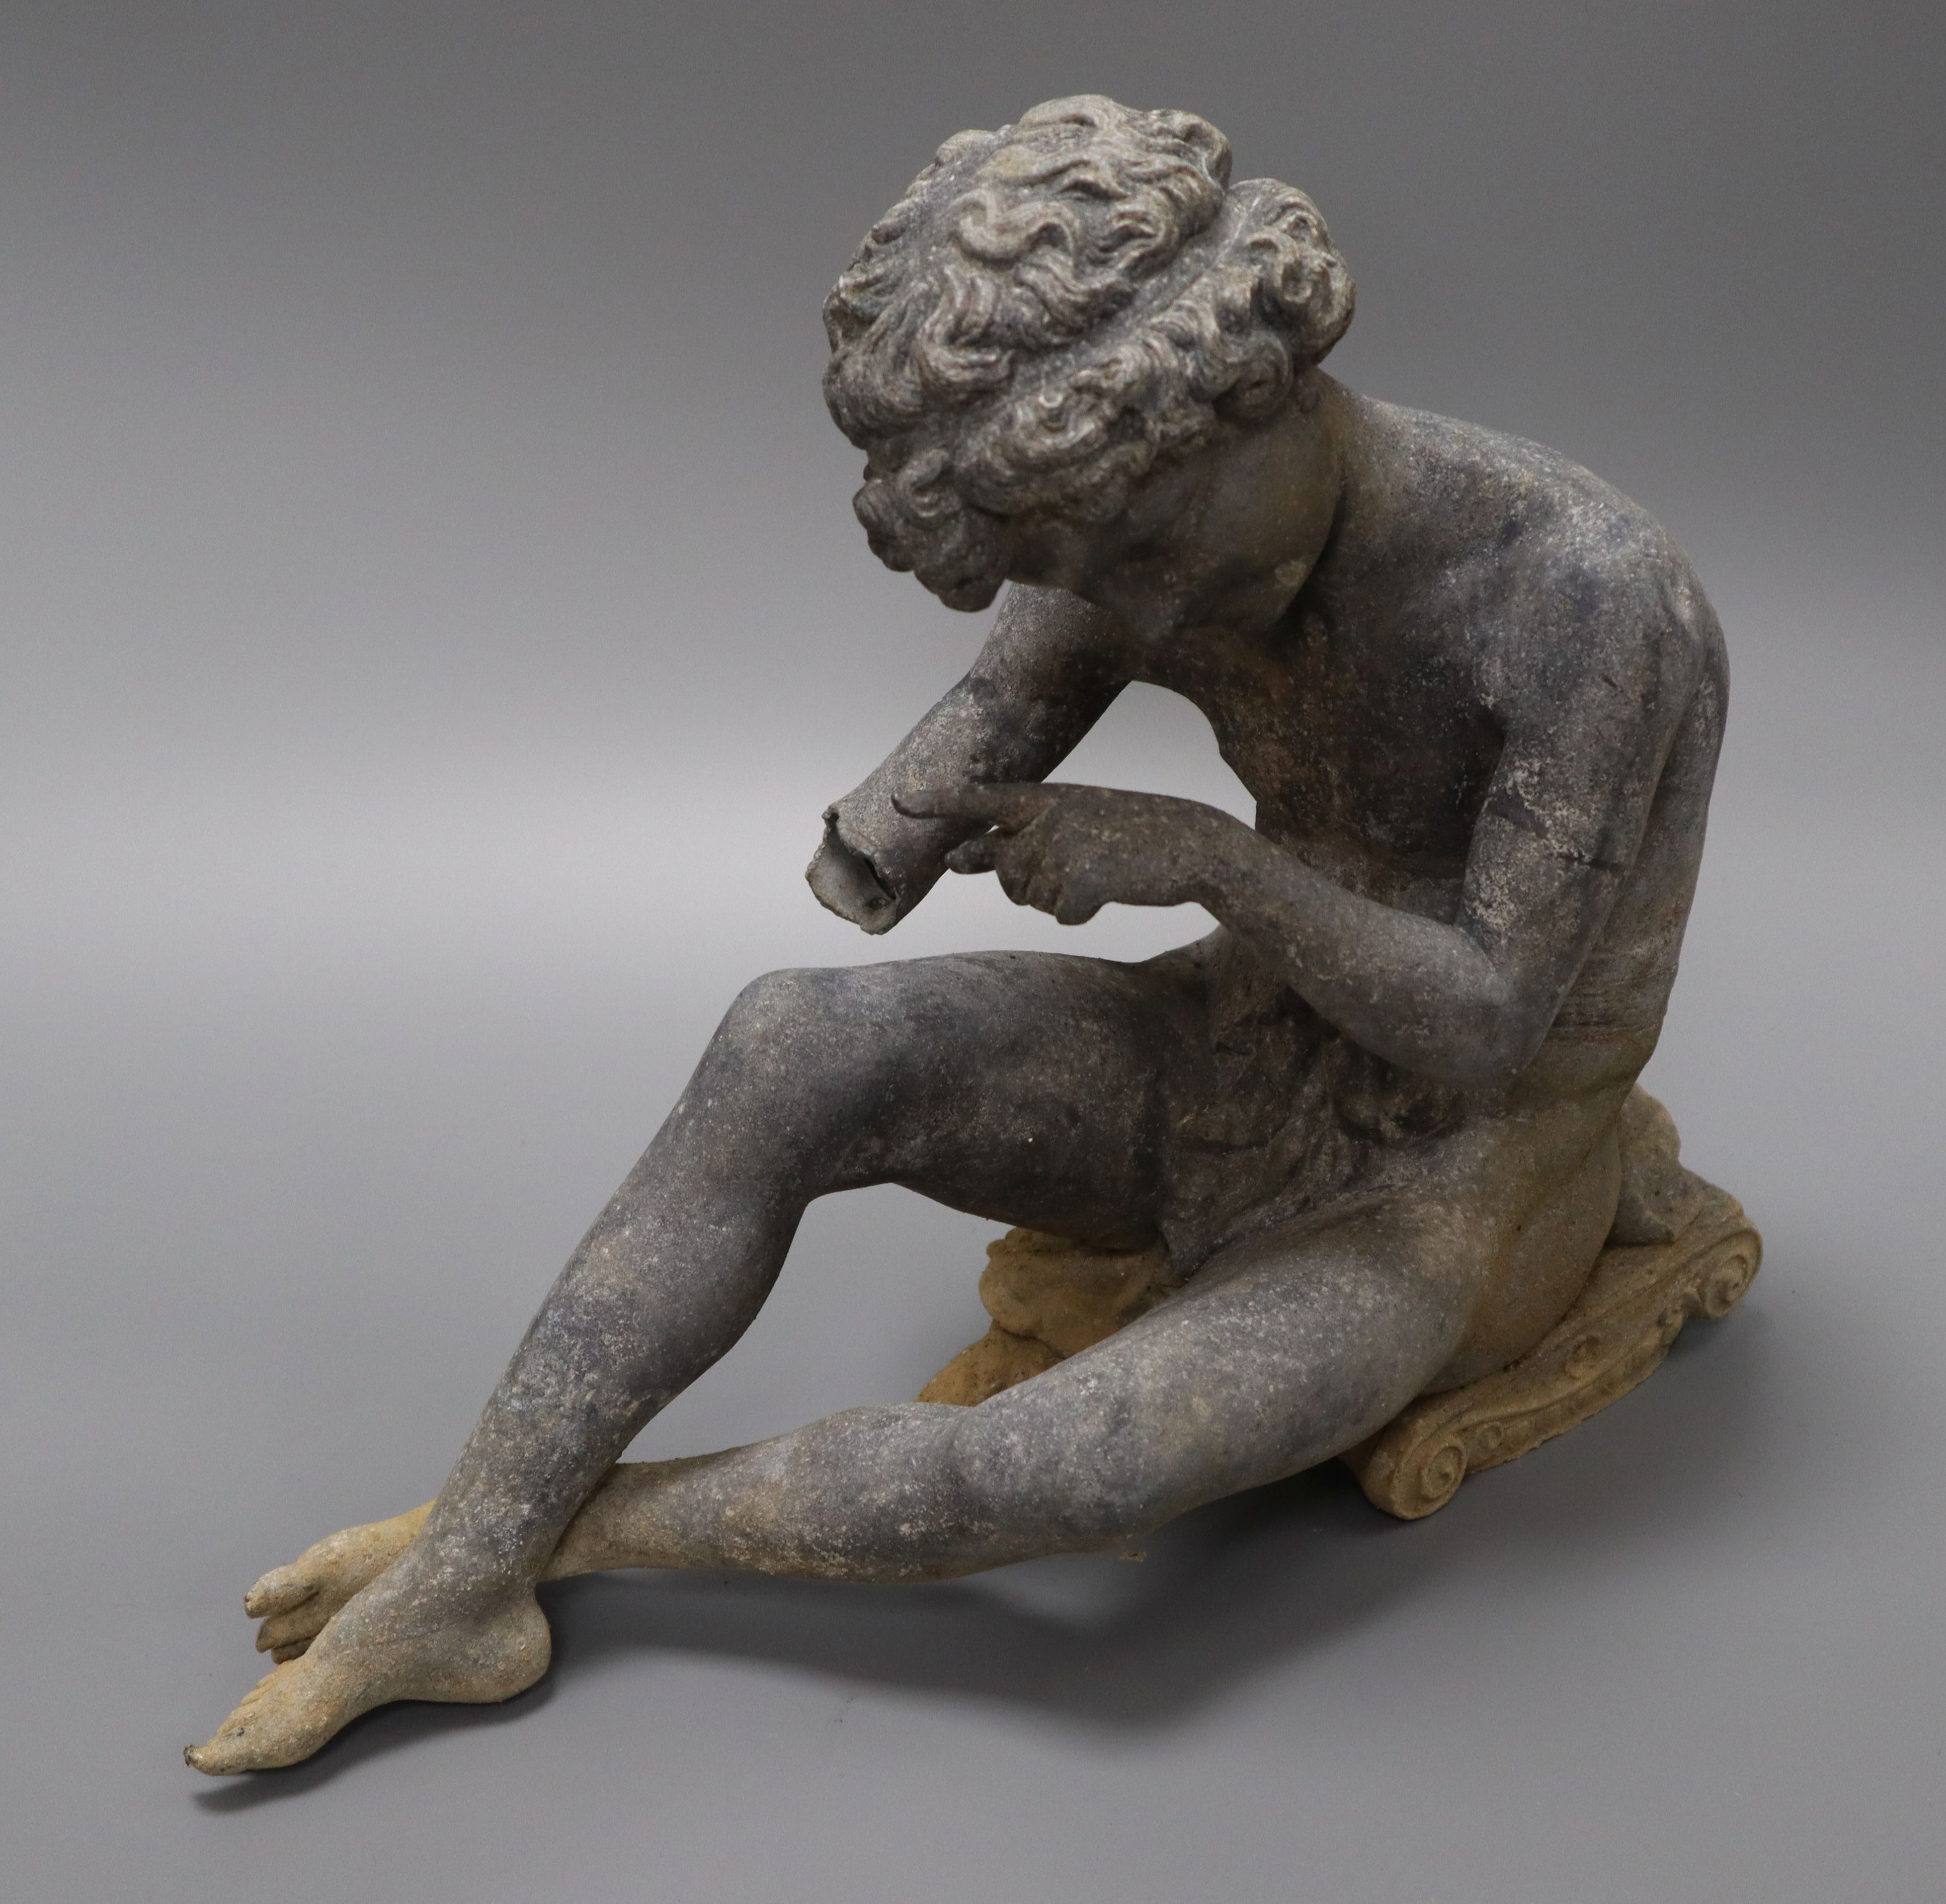 Lot 61 - A garden figure of a seated boy height 27cm